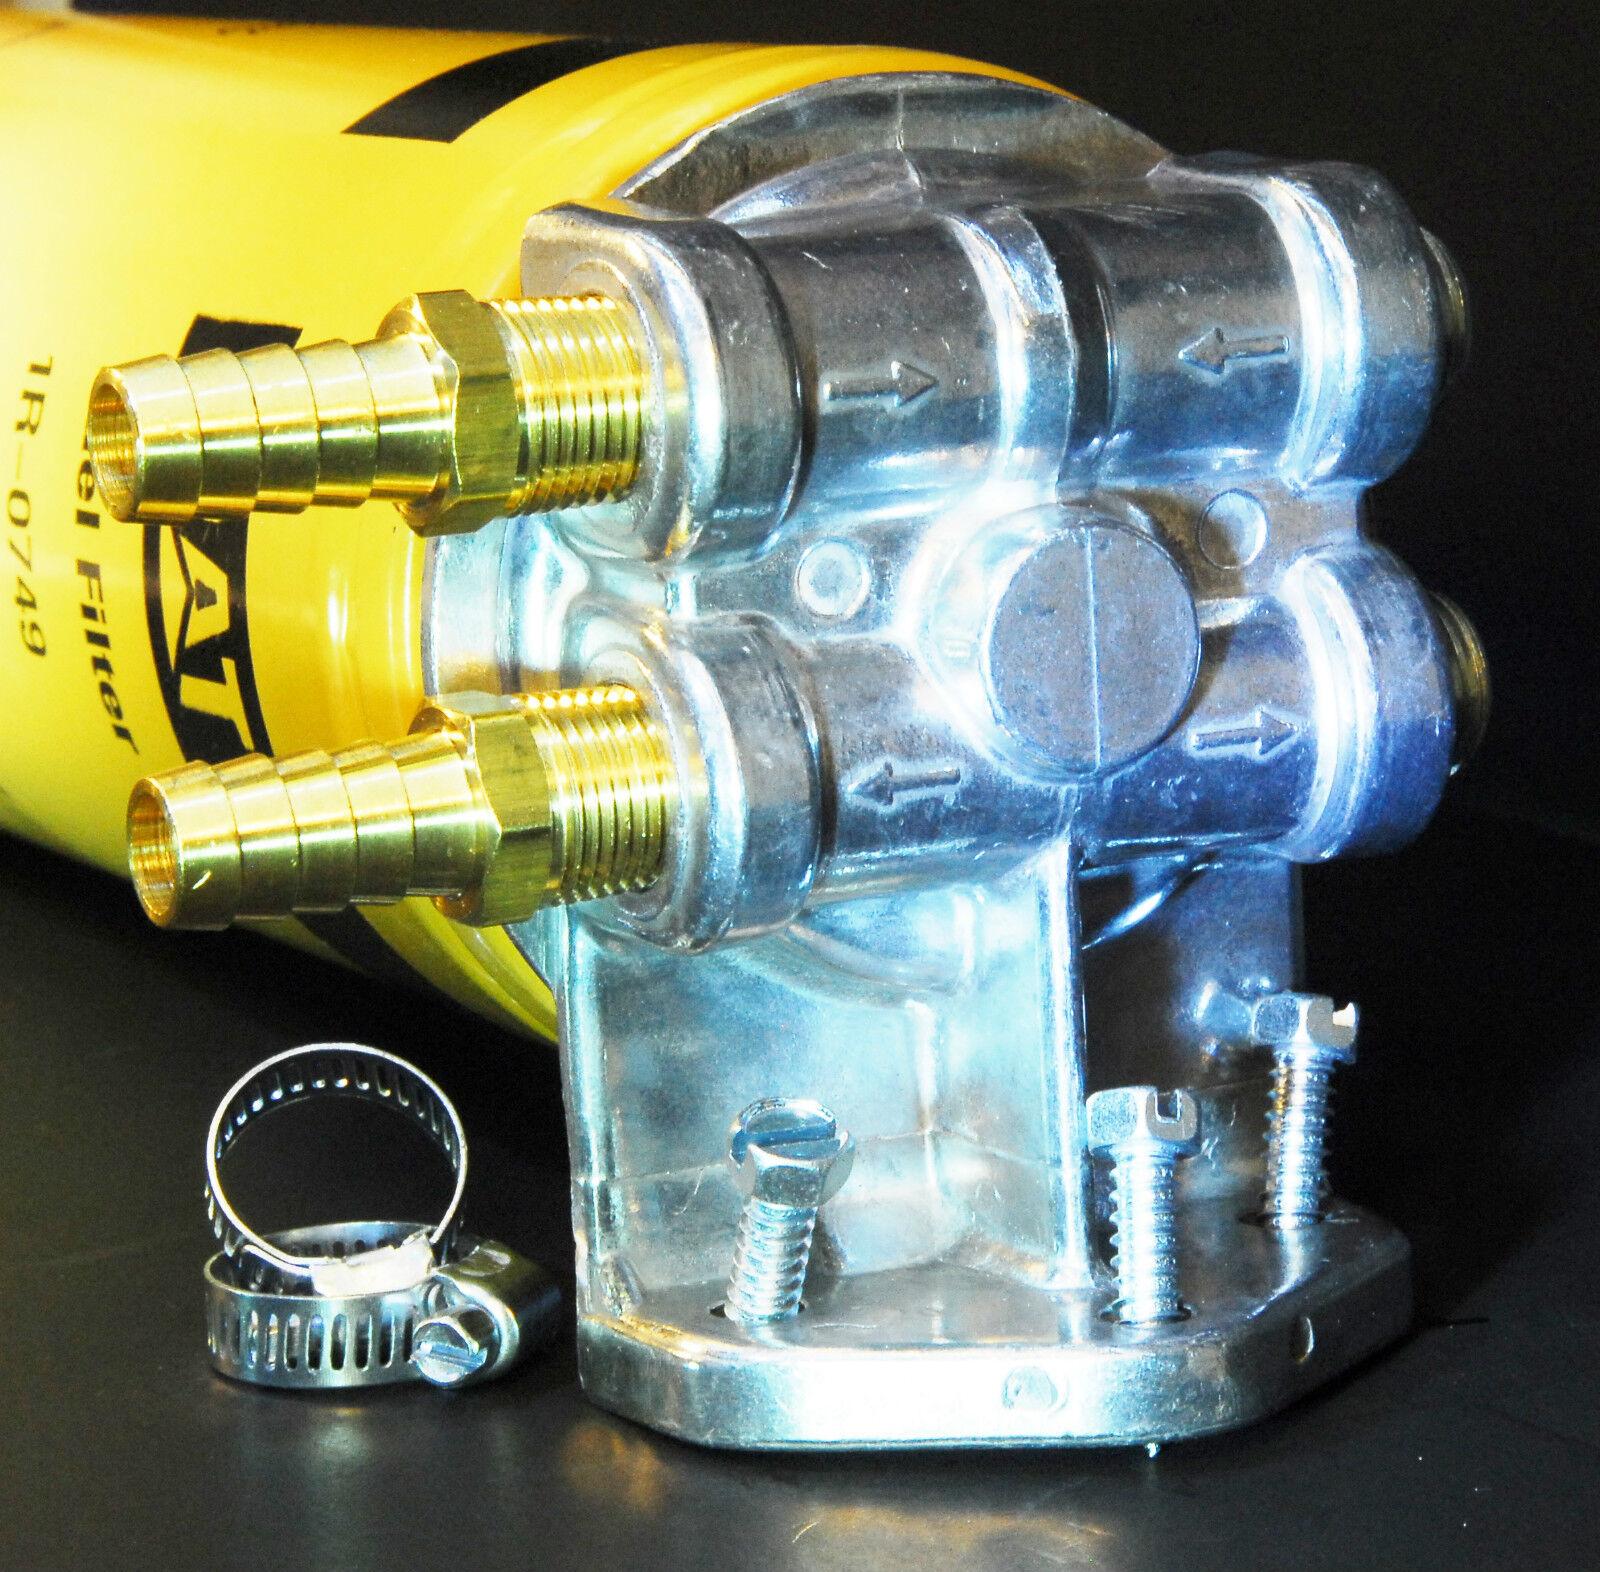 Duramax 66 Lb7 Lly Lbz Lmm Lml Turbo Diesel Fuel Filter Remote Housing 2 Of 5 Mount 3